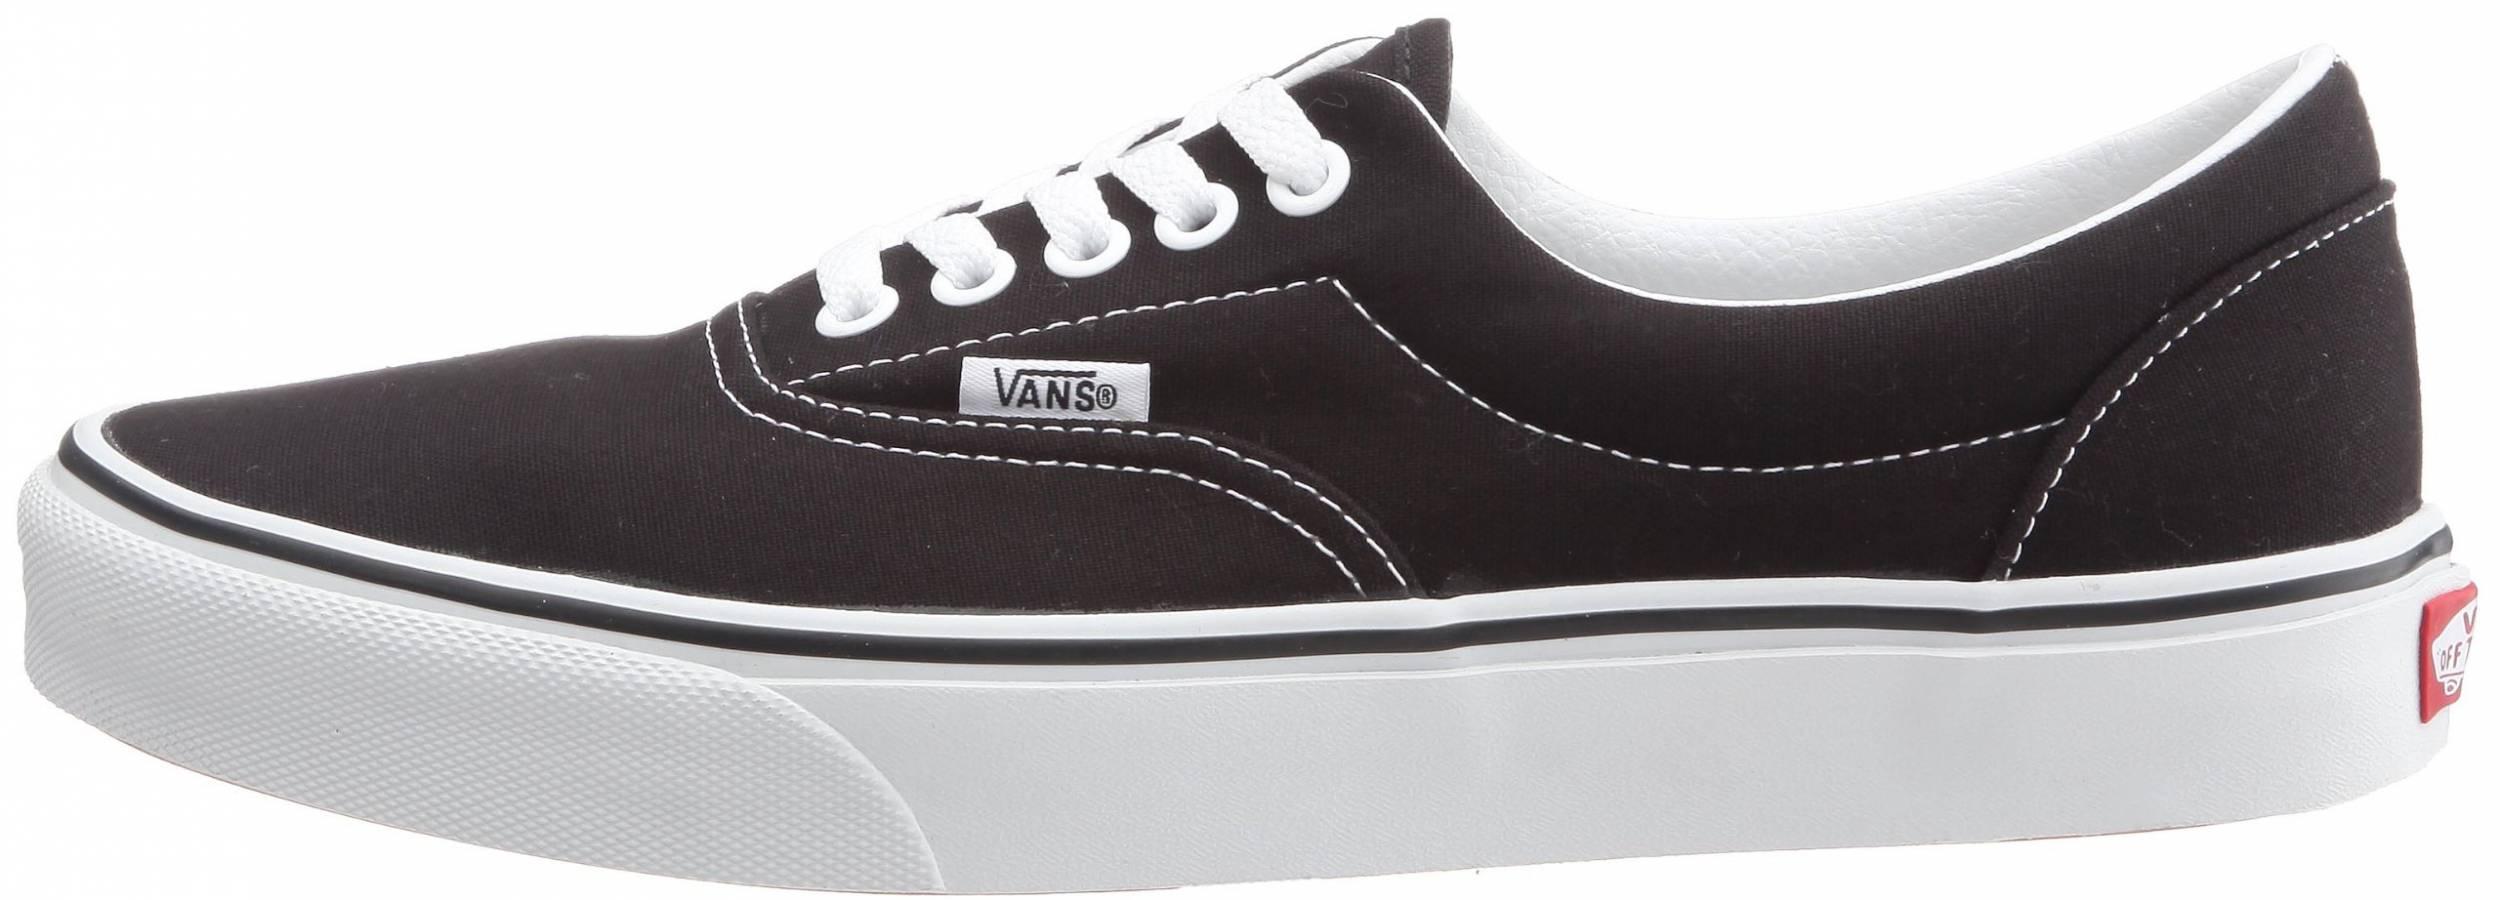 Vans Era sneakers in 10 colors (only $37) | RunRepeat